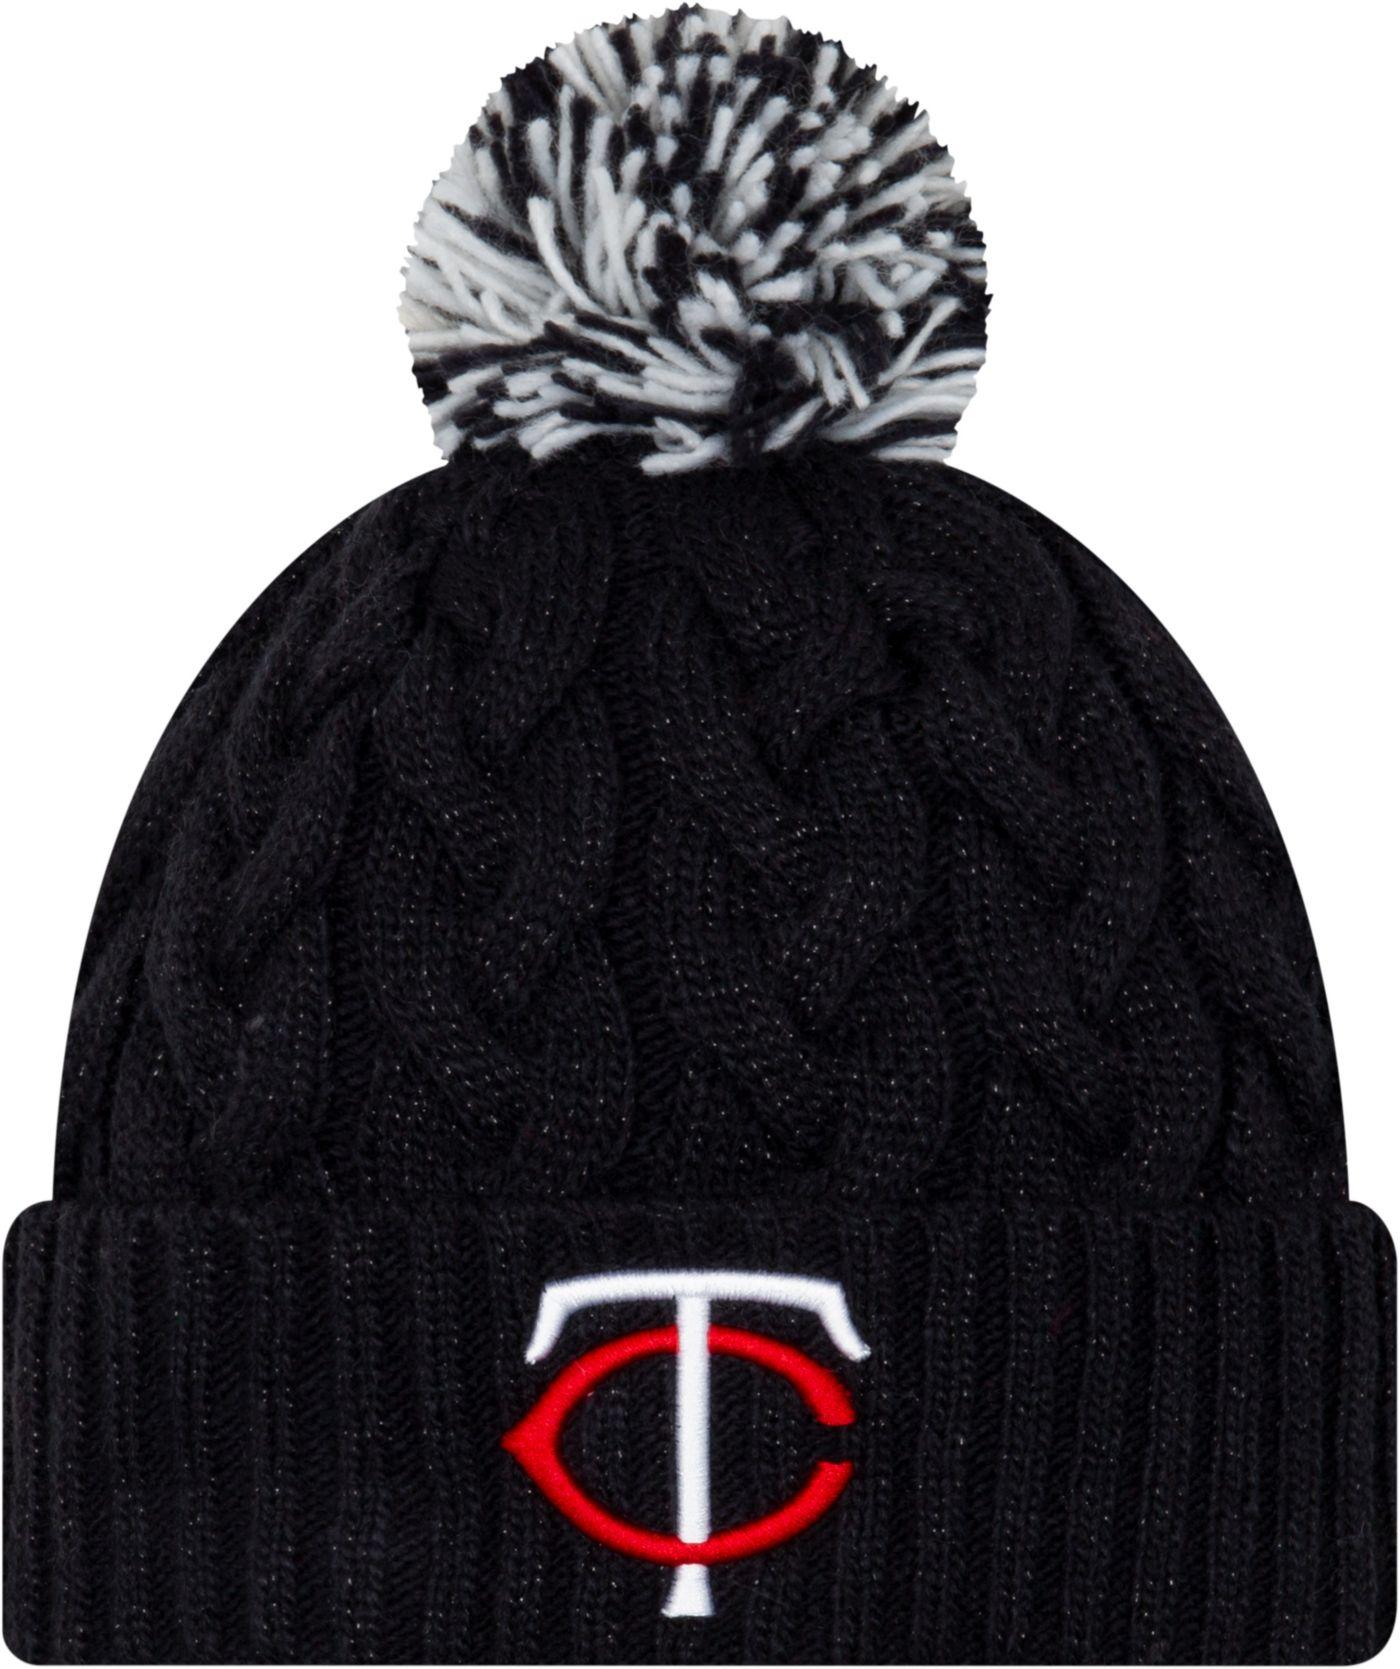 New Era Women's Minnesota Twins Cozy Cable Knit Hat